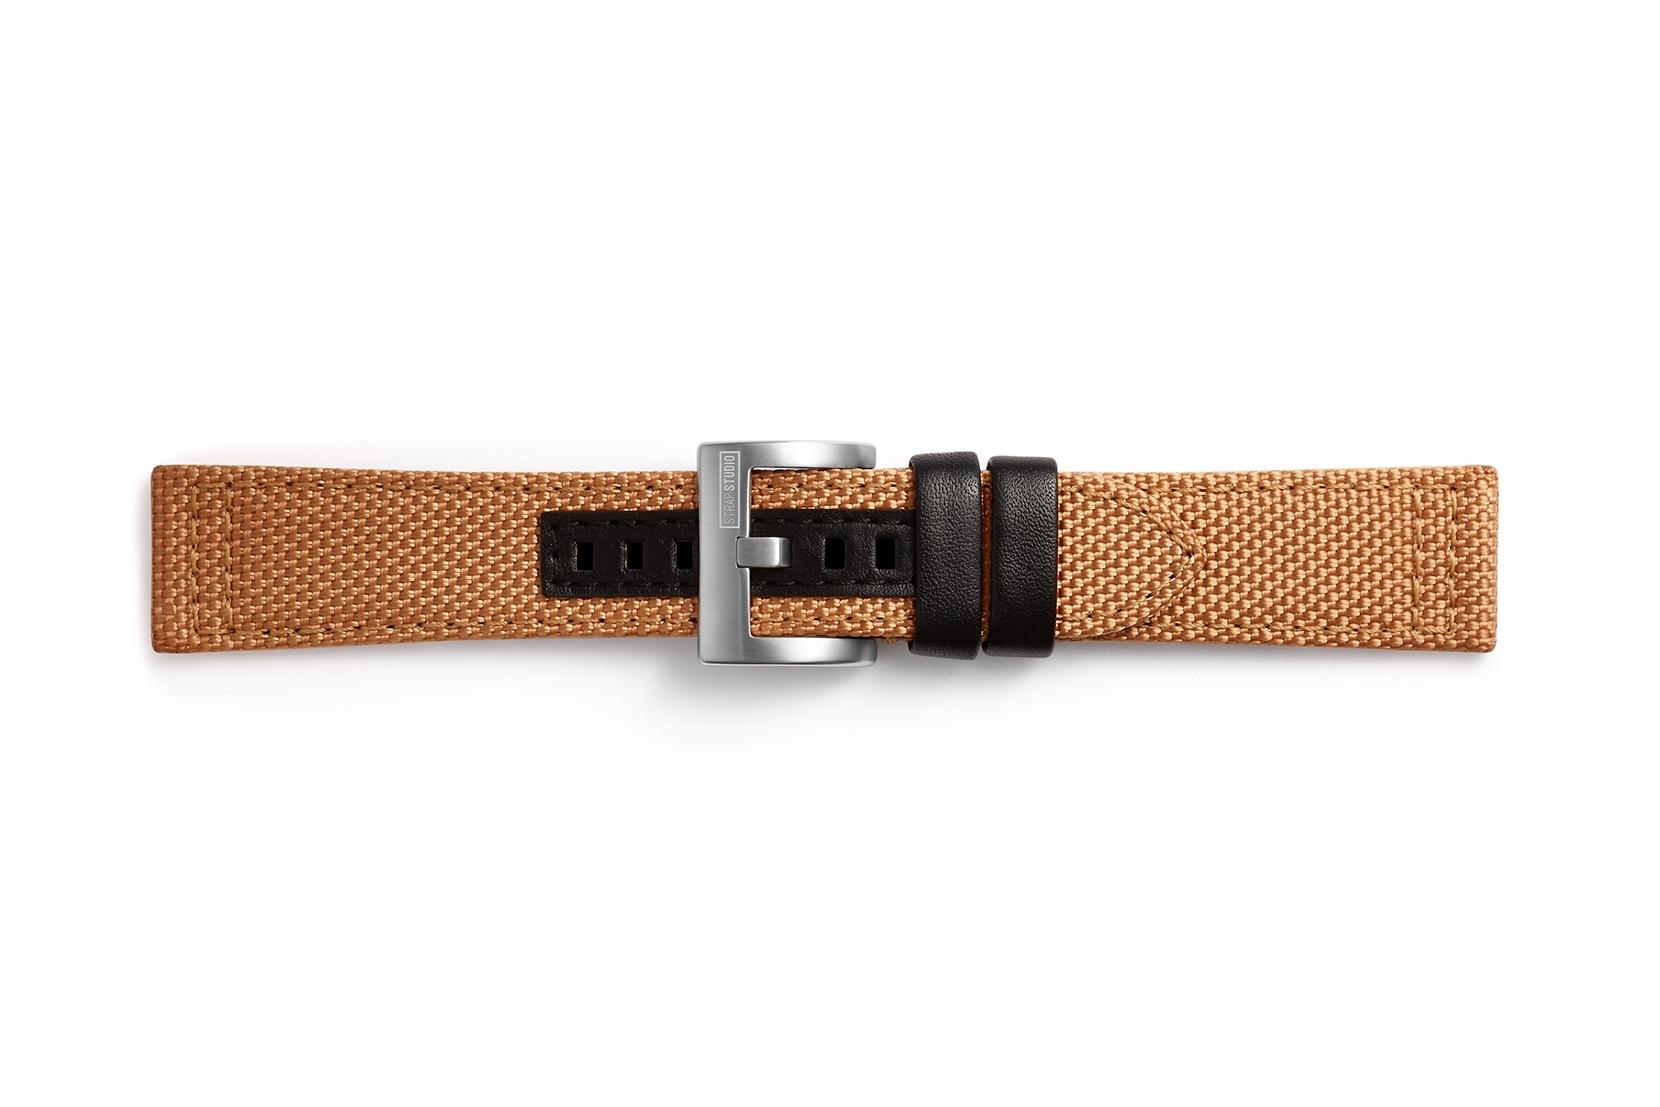 Samsung GP-R770BREECAC smartwatch accessory Band Orange Textile